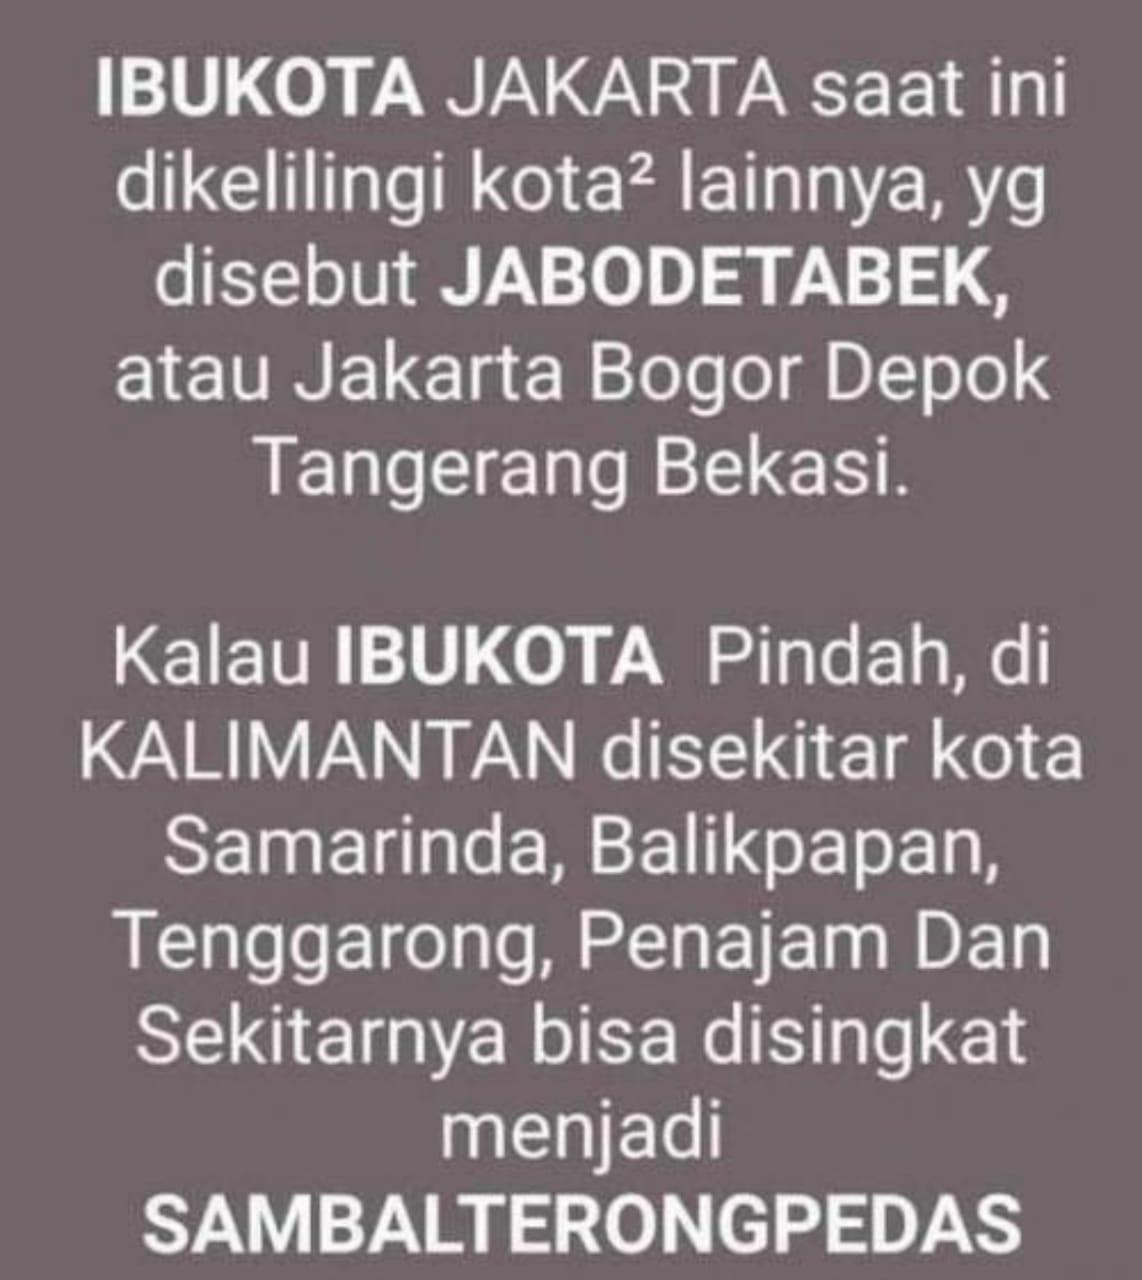 Kalau ibu kota sudah pindah ke Kalimantan Timur, daerah penyangganya juga ada dan sebutannya jadi SAMBAL TERONGPEDAS.